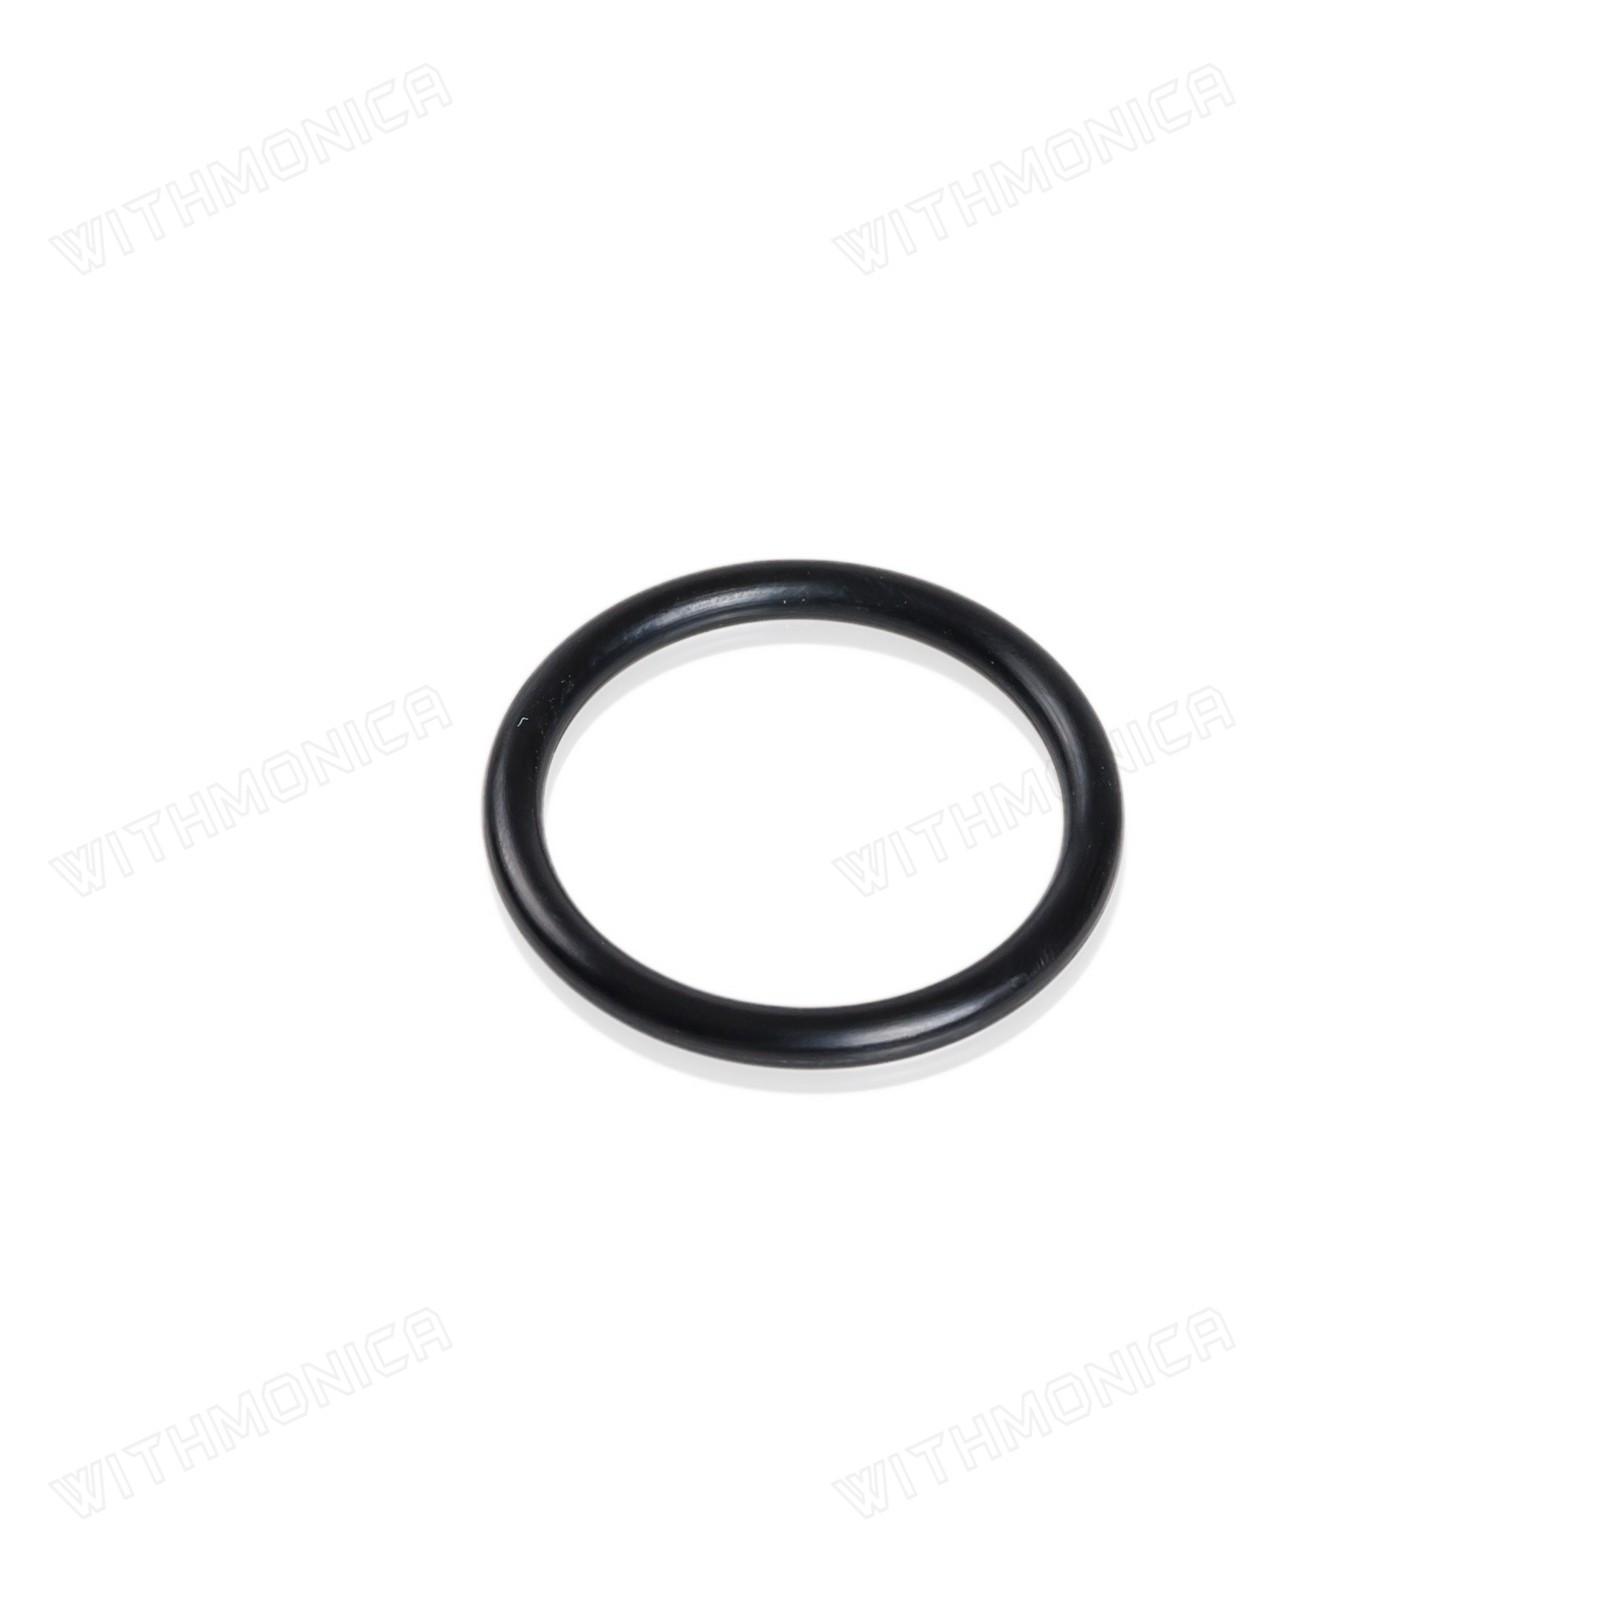 For Toyota 4Runner Celica Corolla Pickup Distributor O-Ring Stone 90099 14091